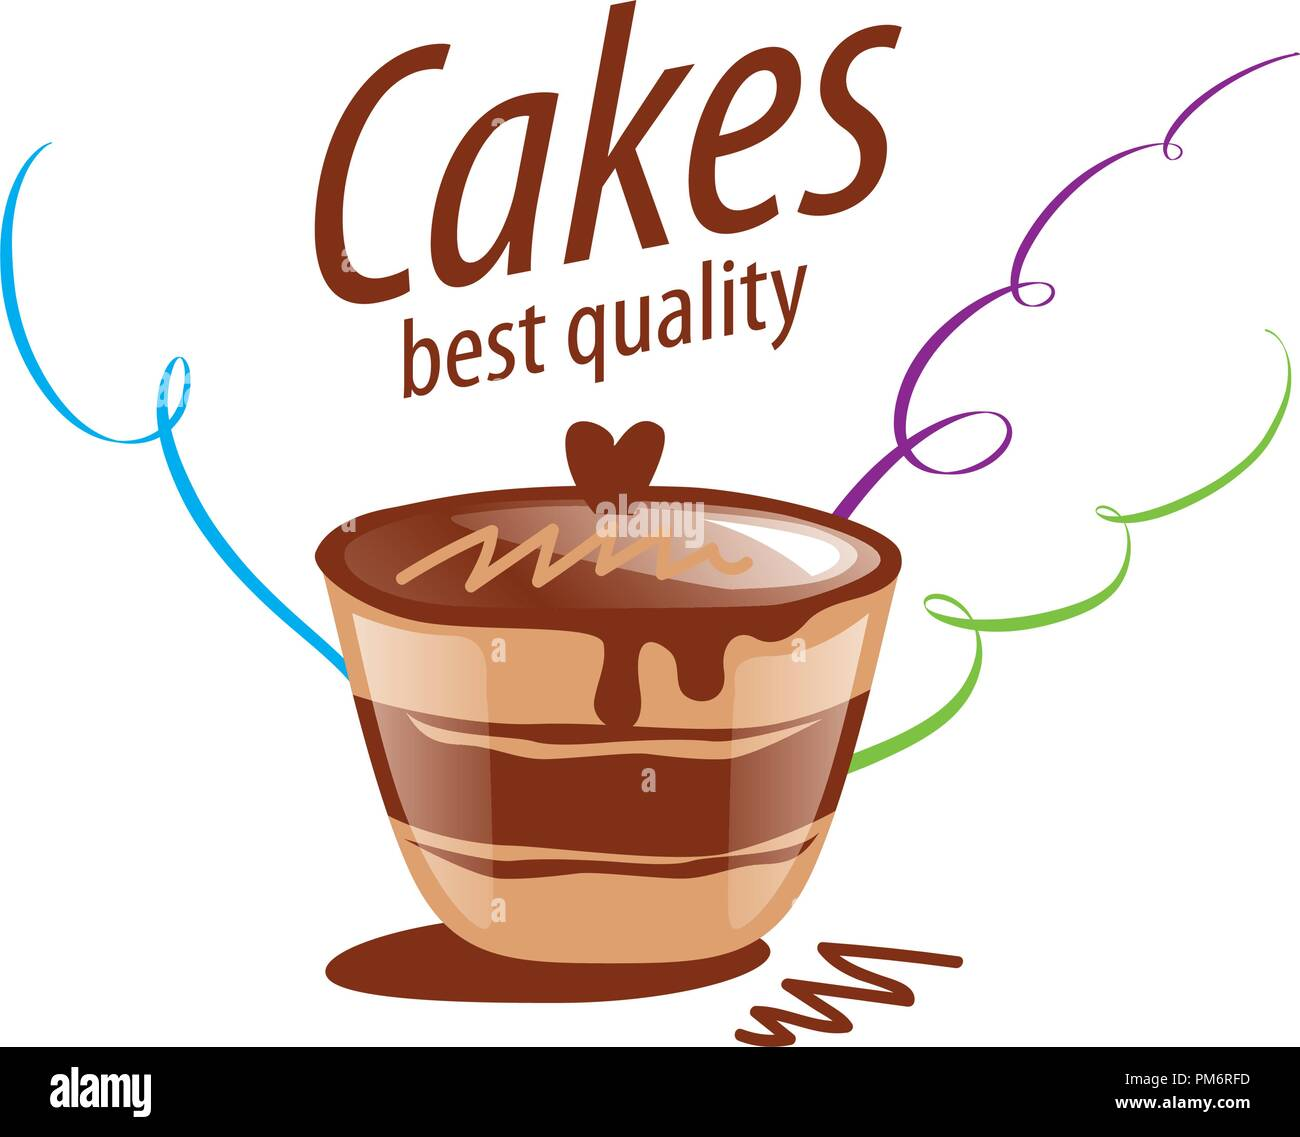 vector cake logo Stock Vector Art & Illustration, Vector Image